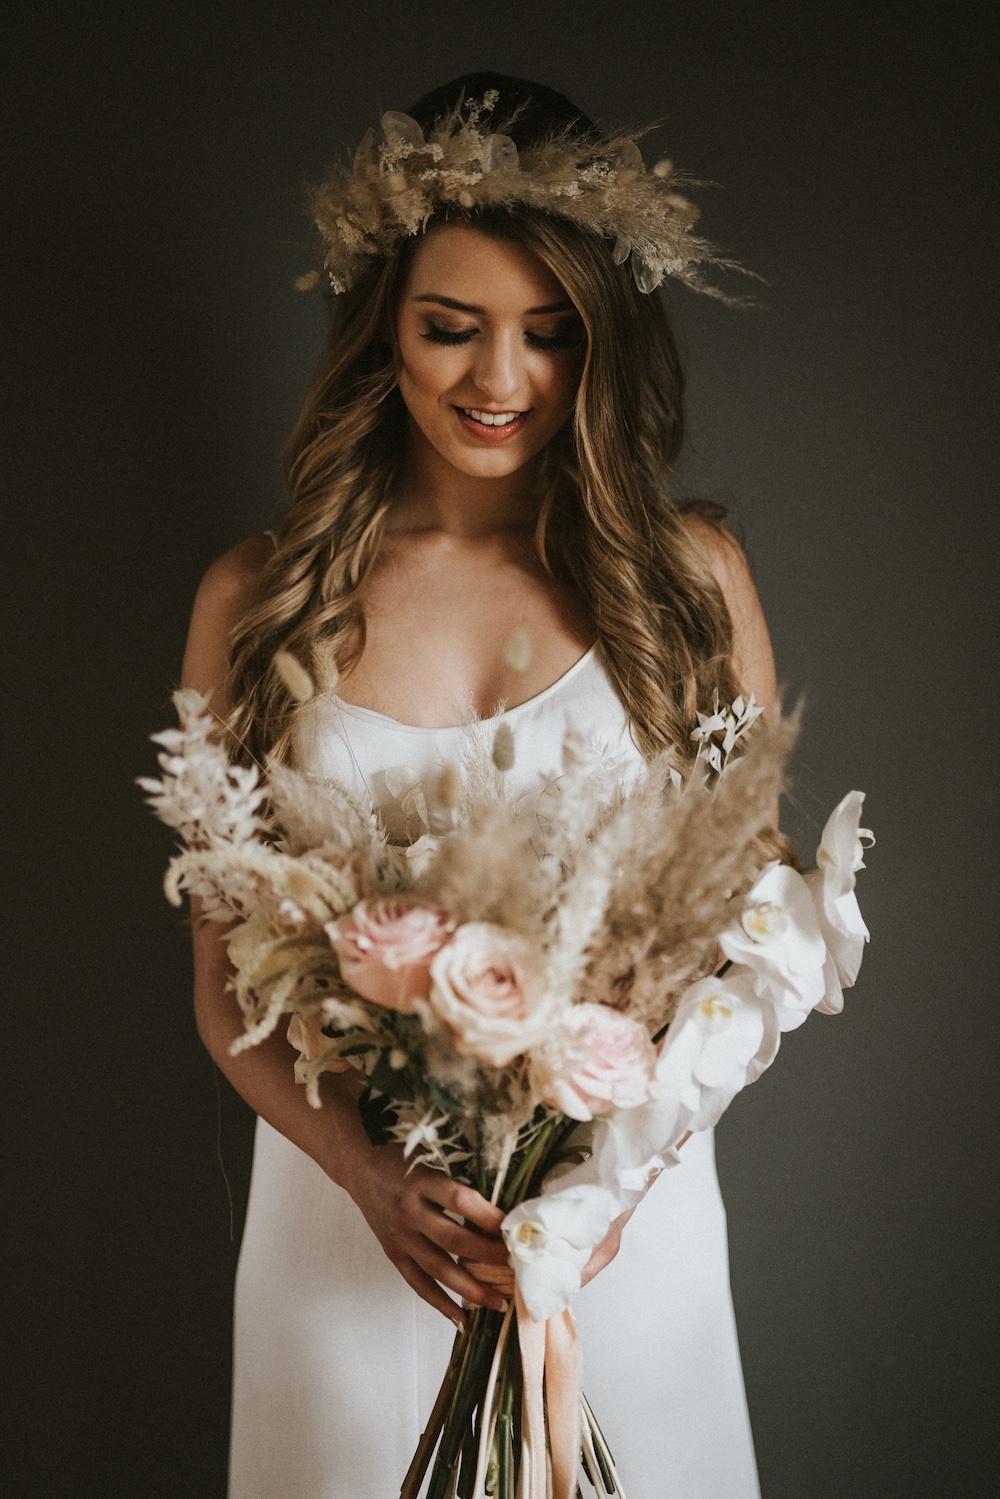 Bride Bridal Flower Crown Ballet Wedding Ideas Henry Lowther Photographer